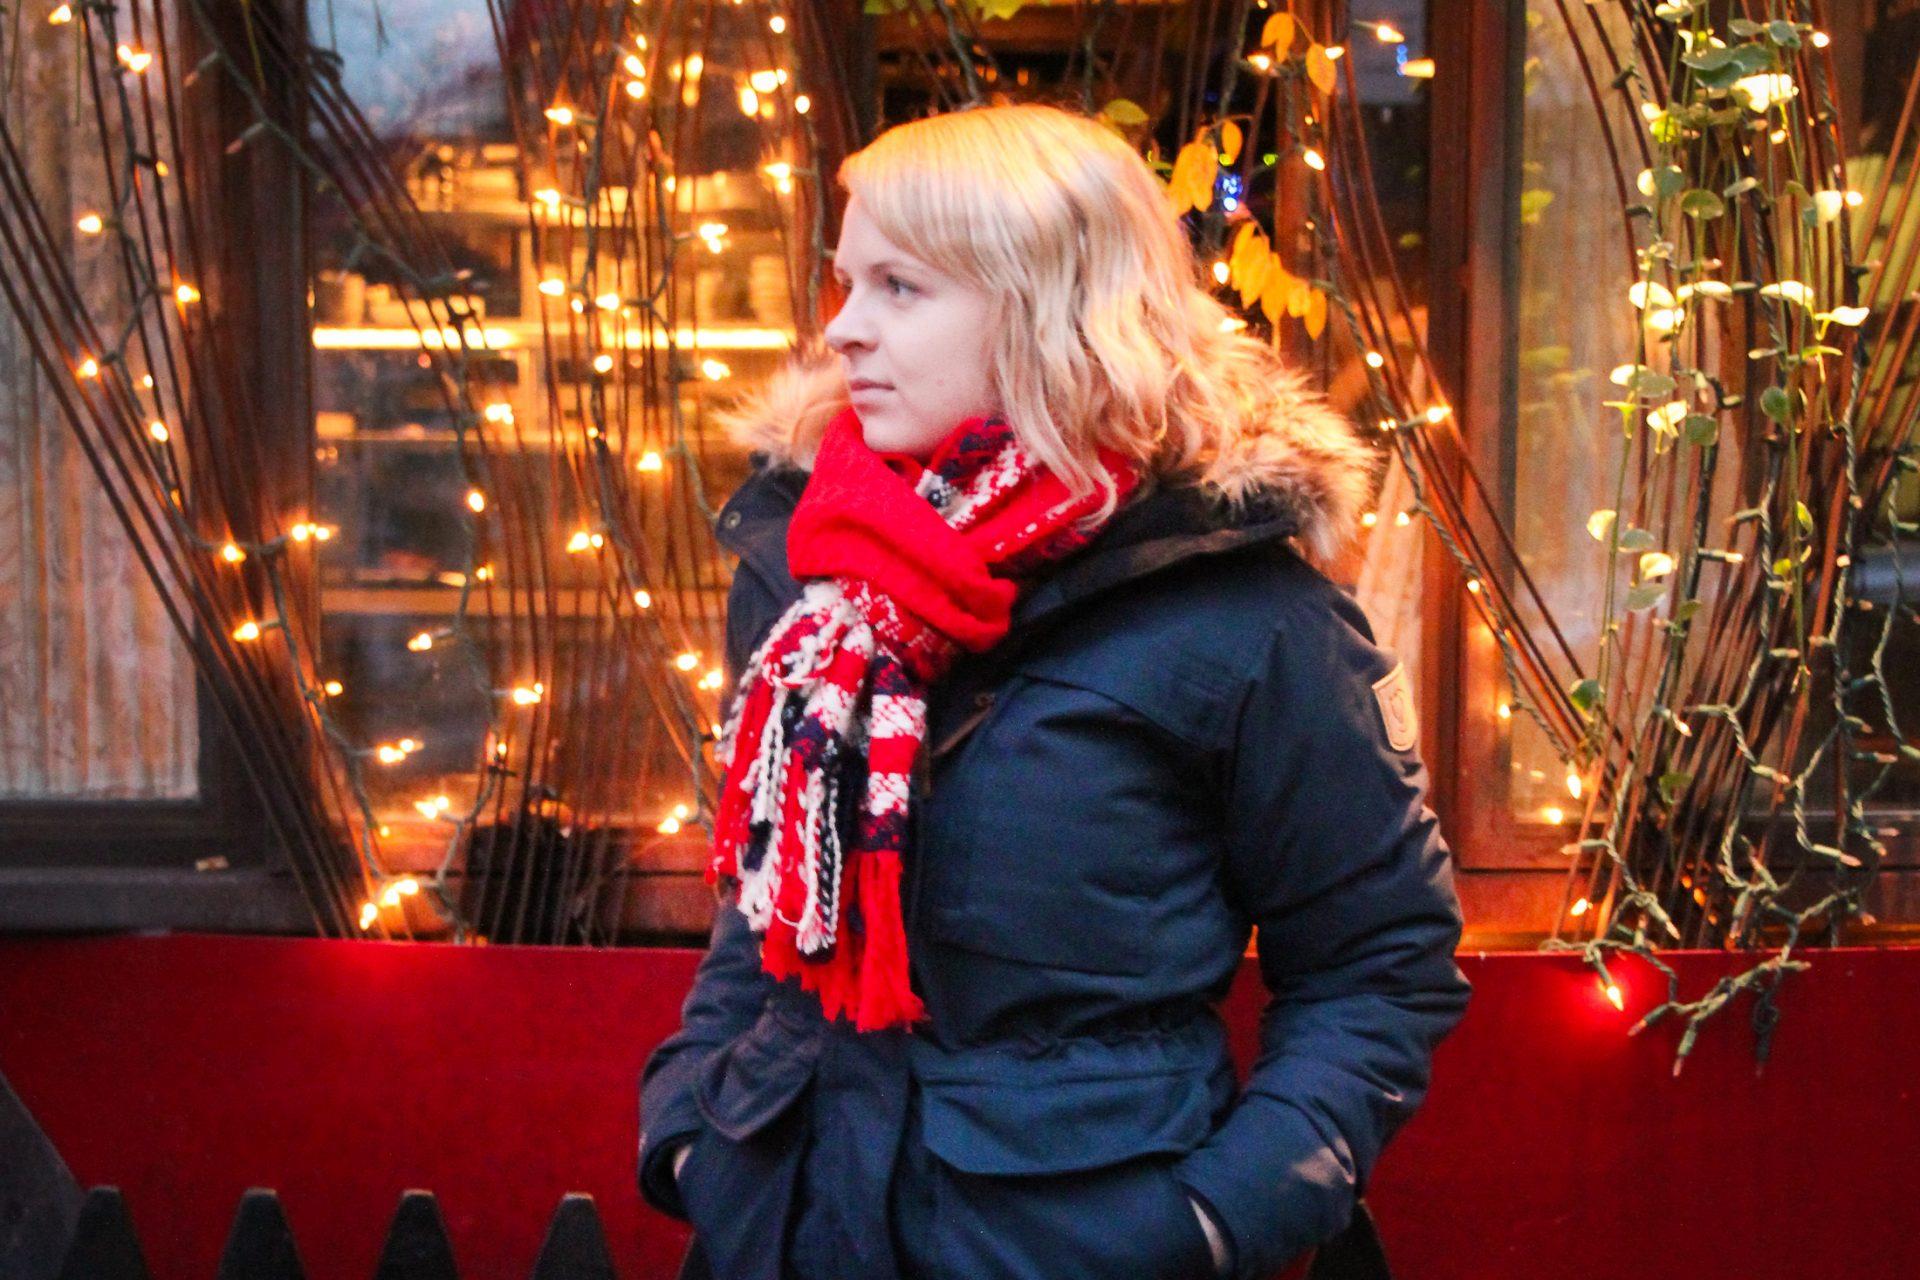 How to buy good quality vegan winter gear